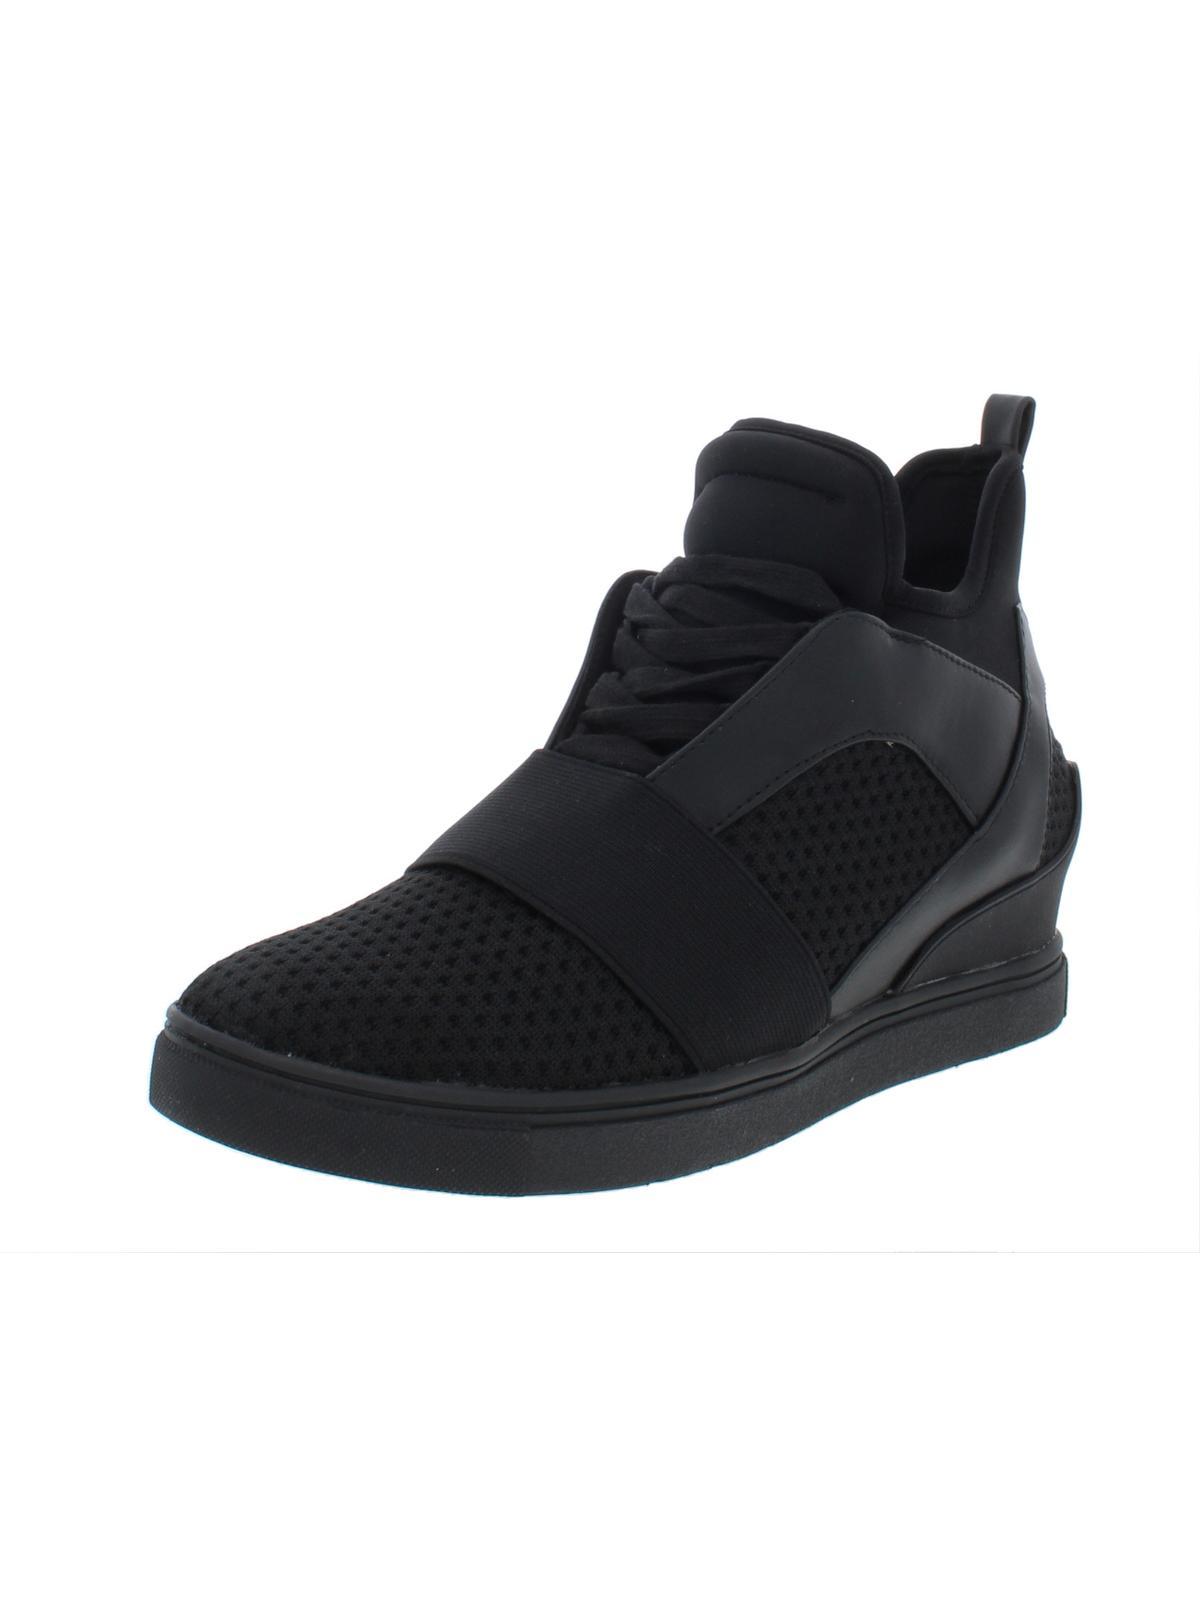 66cbae2c472 Steve Madden Womens Lexi Neoprene Hidden Wedge Fashion Sneakers